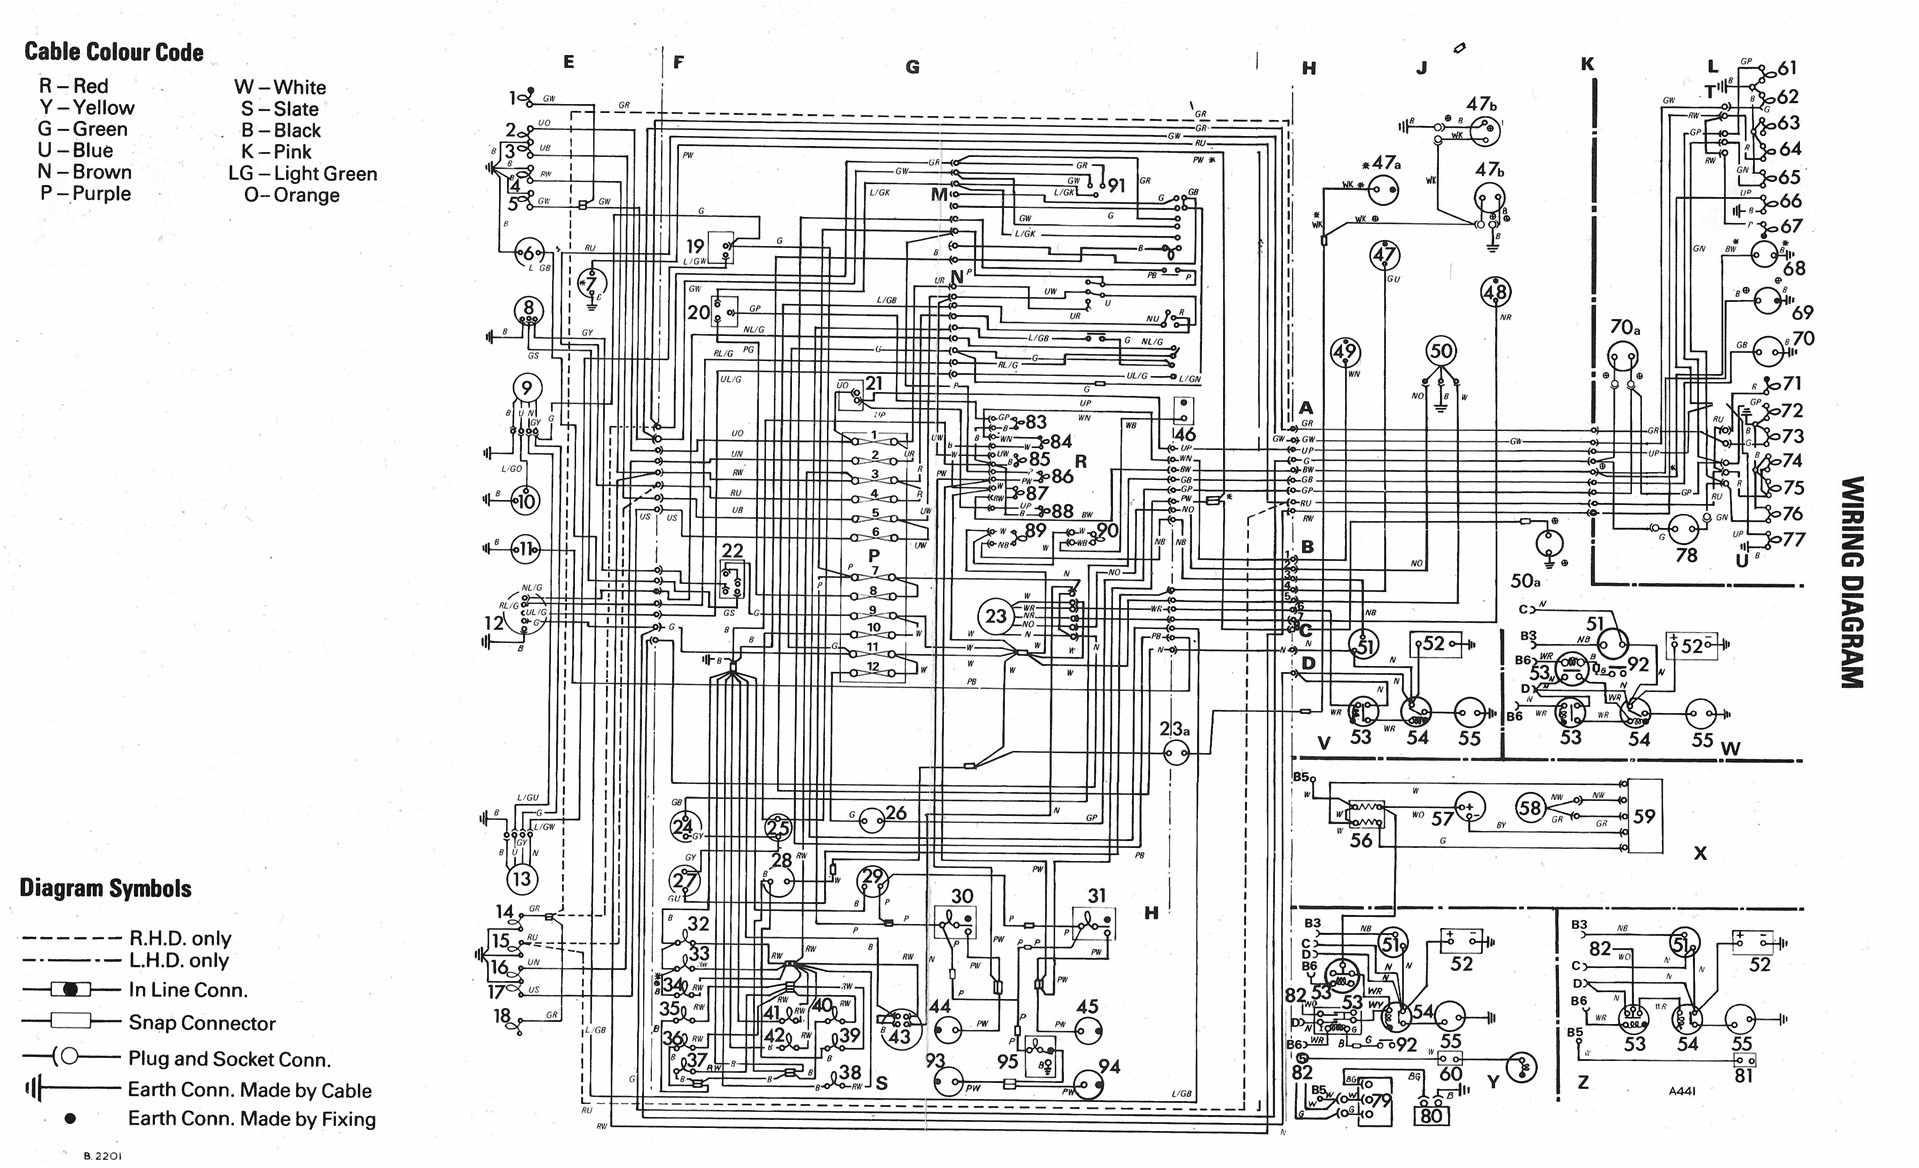 hight resolution of 2006 jetta engine diagram wiring library rh 30 codingcommunity de 1996 jetta 1997 volkswagen jetta engine diagram